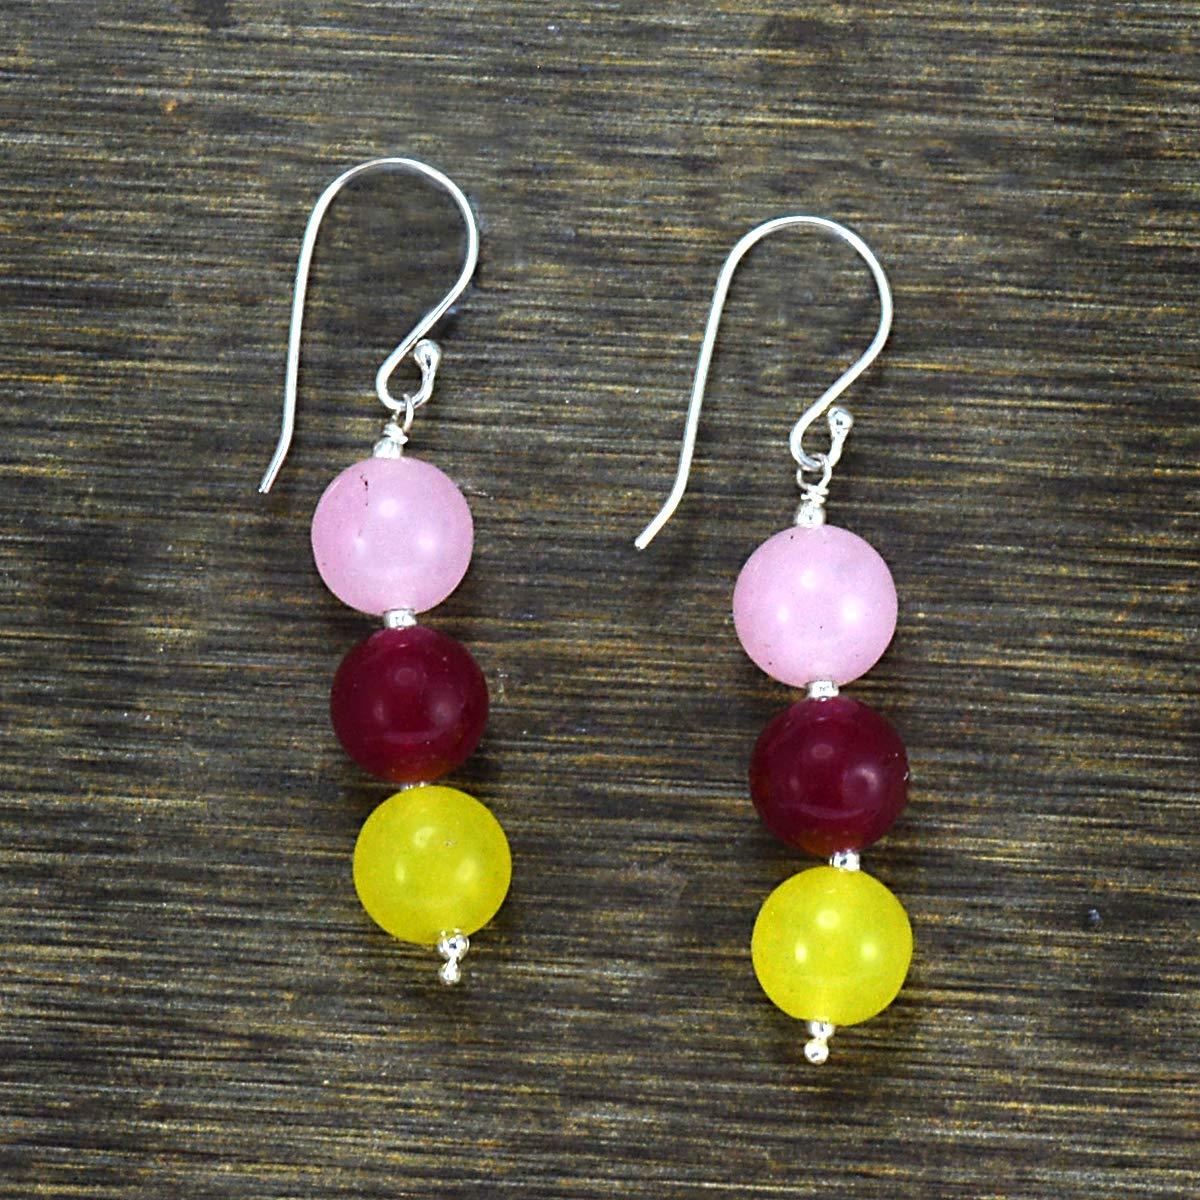 Pink Yellow /& Rose Quartz Fish-hook 925 Sterling Silver Earring Jaipur Rajasthan India Handmade Jewelry Manufacturer Round Beads Layering